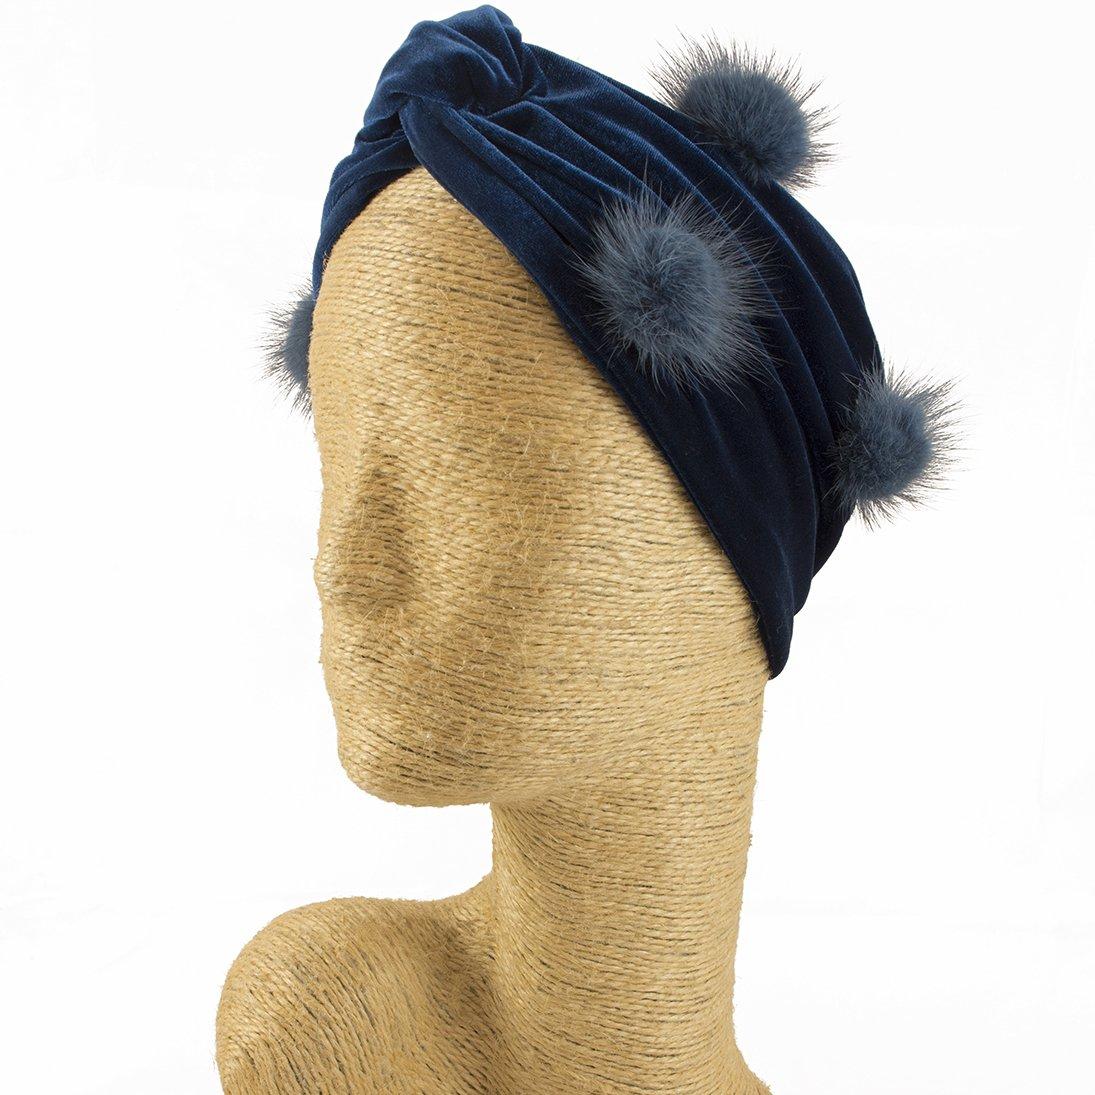 Fascinator, Velvet Headbands, Millinery, Worldwide Free Shipment, Delivery in 2 Days, Customized Tailoring, Designer Fashion, Head wrap, Bohemian Accessories, Blue, Pom Pom, Boho Chic